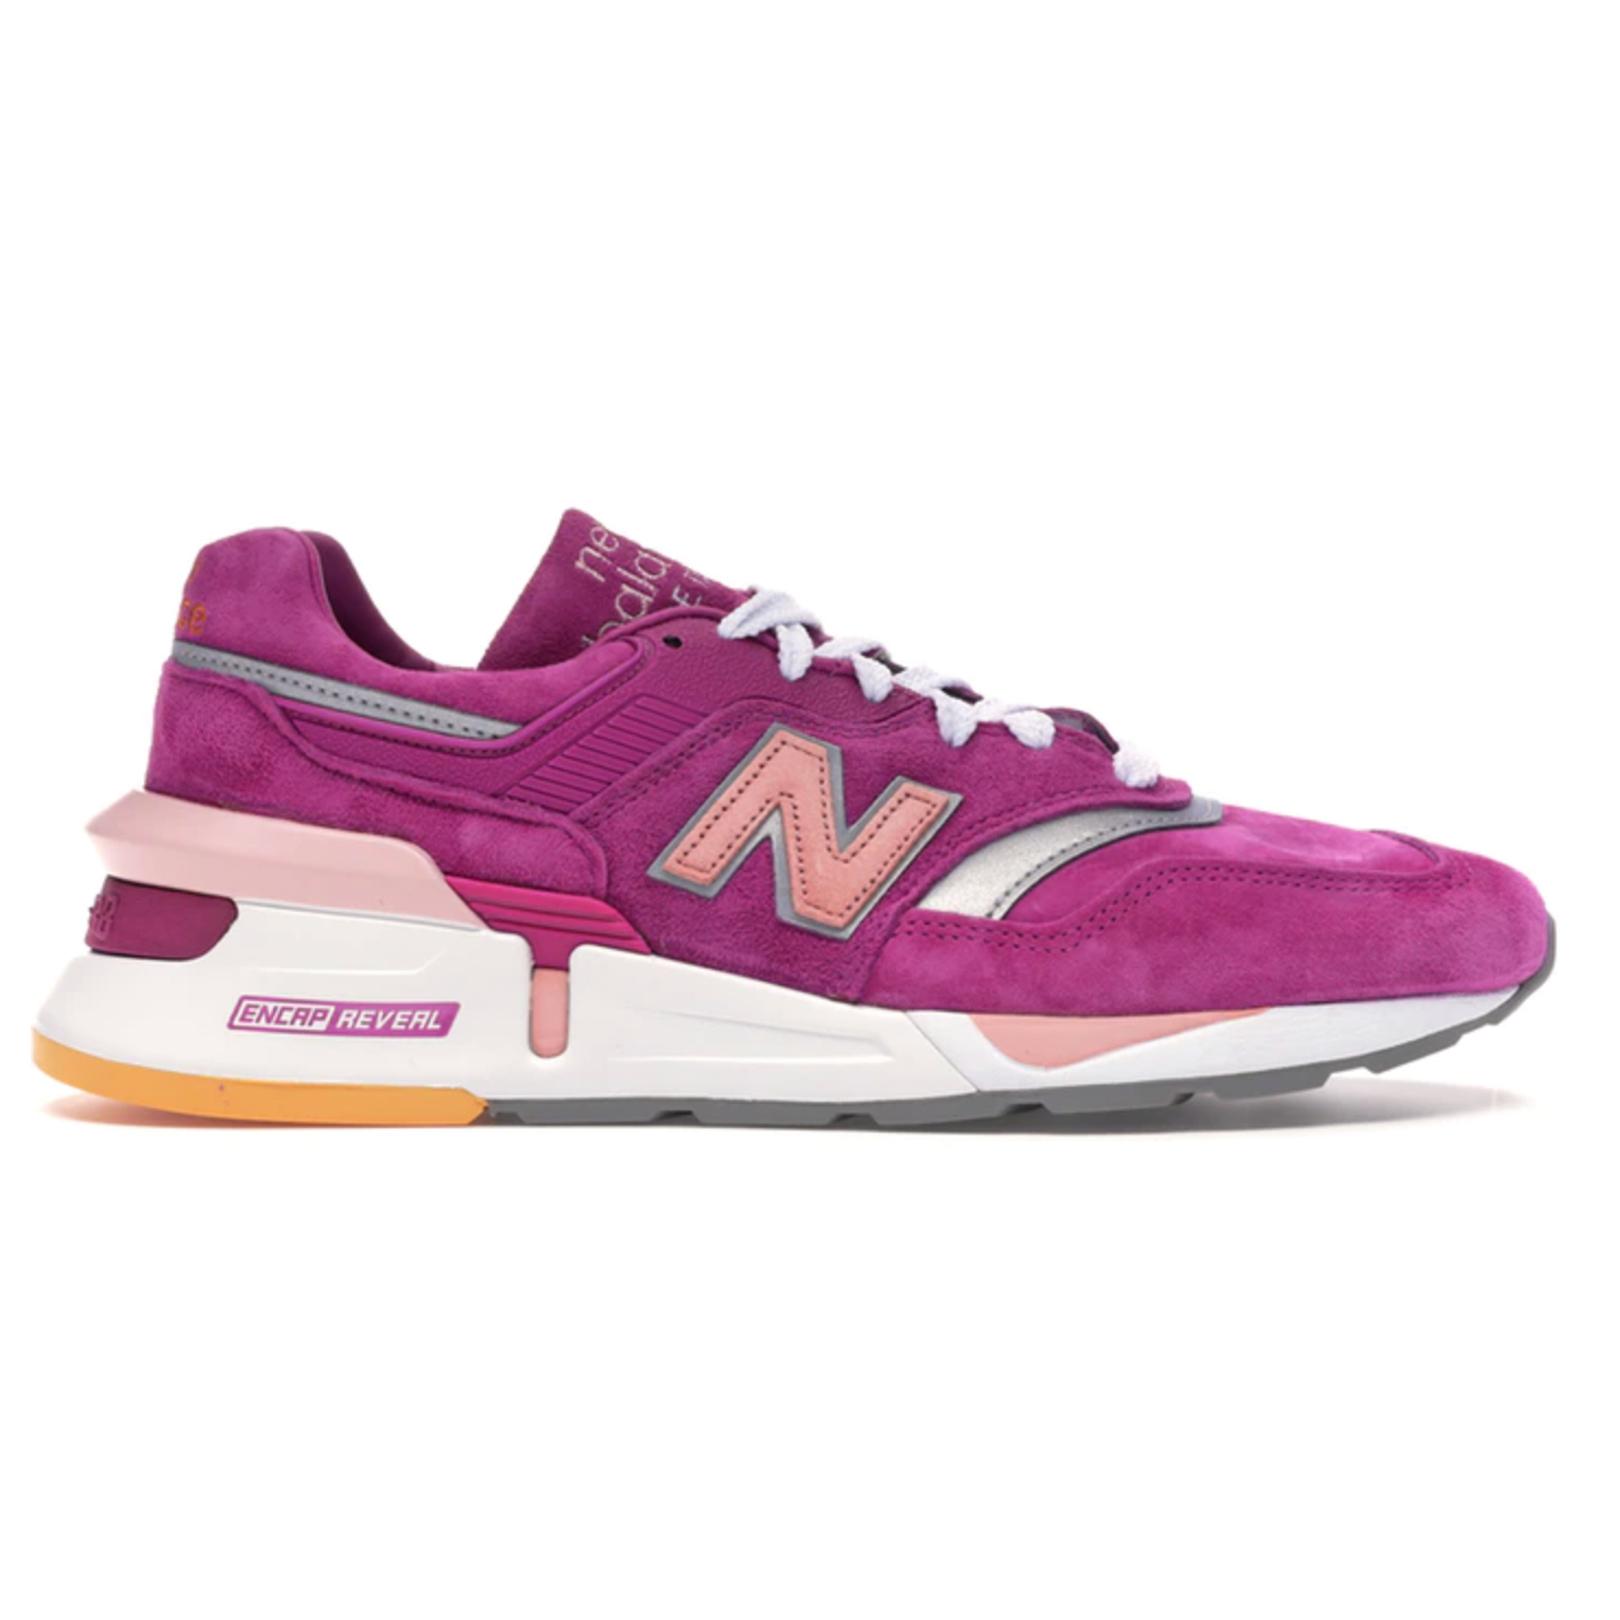 997 sport new balance bambino